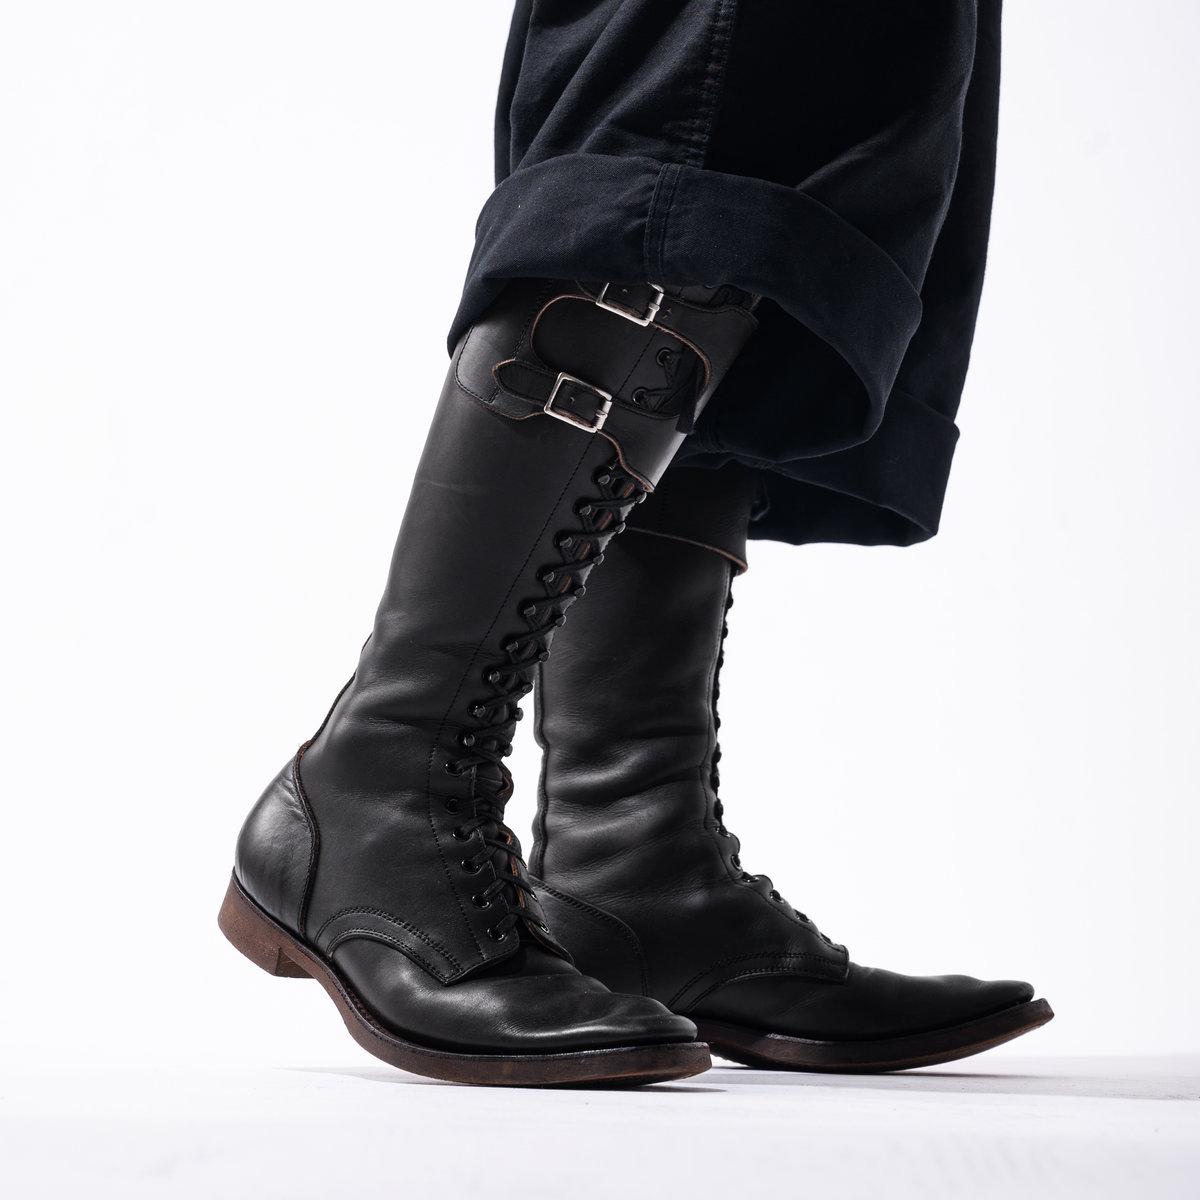 BS x Clinch - Transcontinental Boots - Onbody-03.jpg